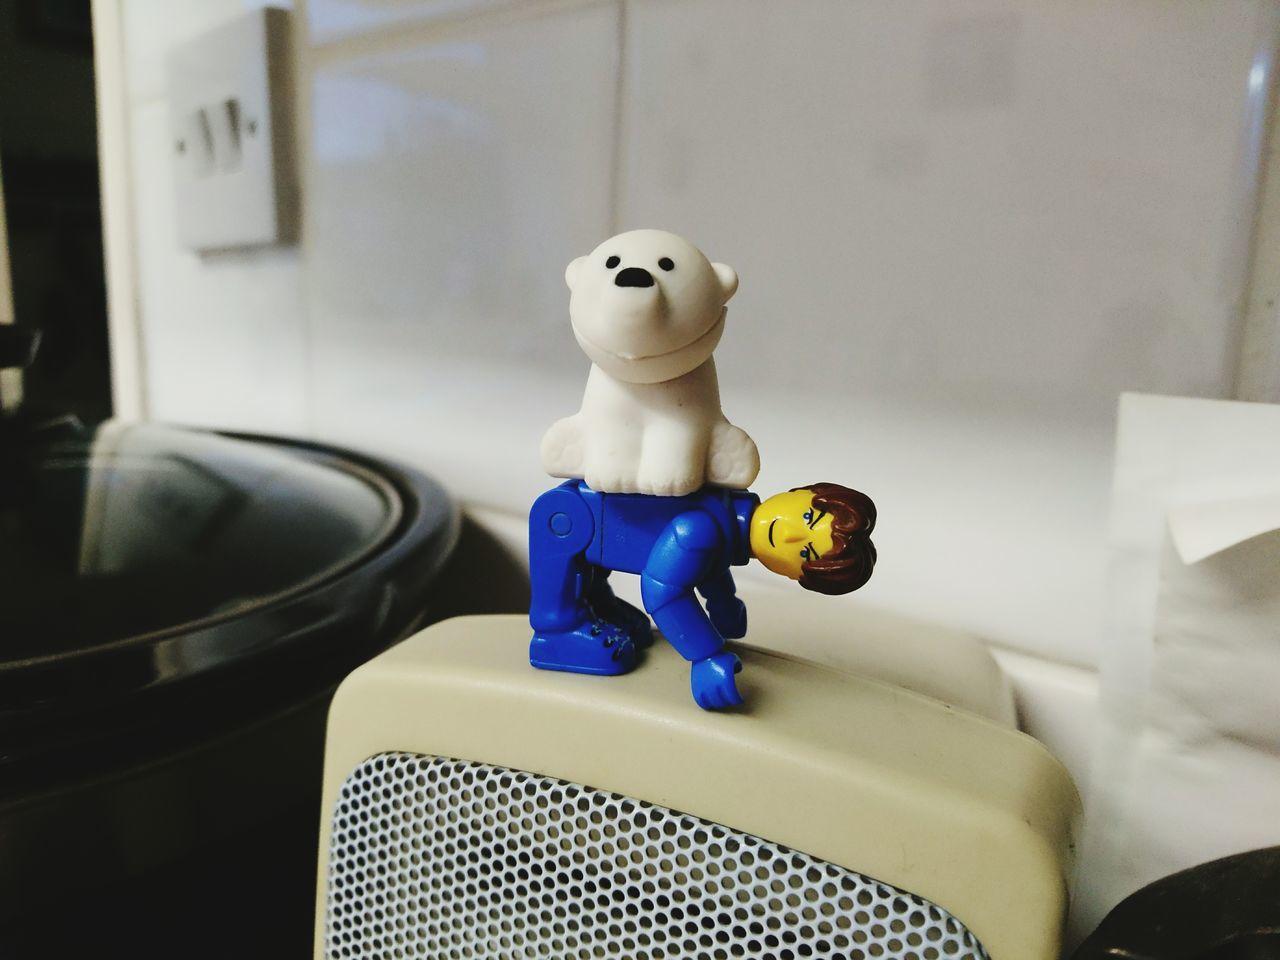 Logo Man And His Bear Human Representation Blue No People LEGO Legophotography Lego Minifigures Toy Toyphotography Toy Animal Toy Adventures Uniform